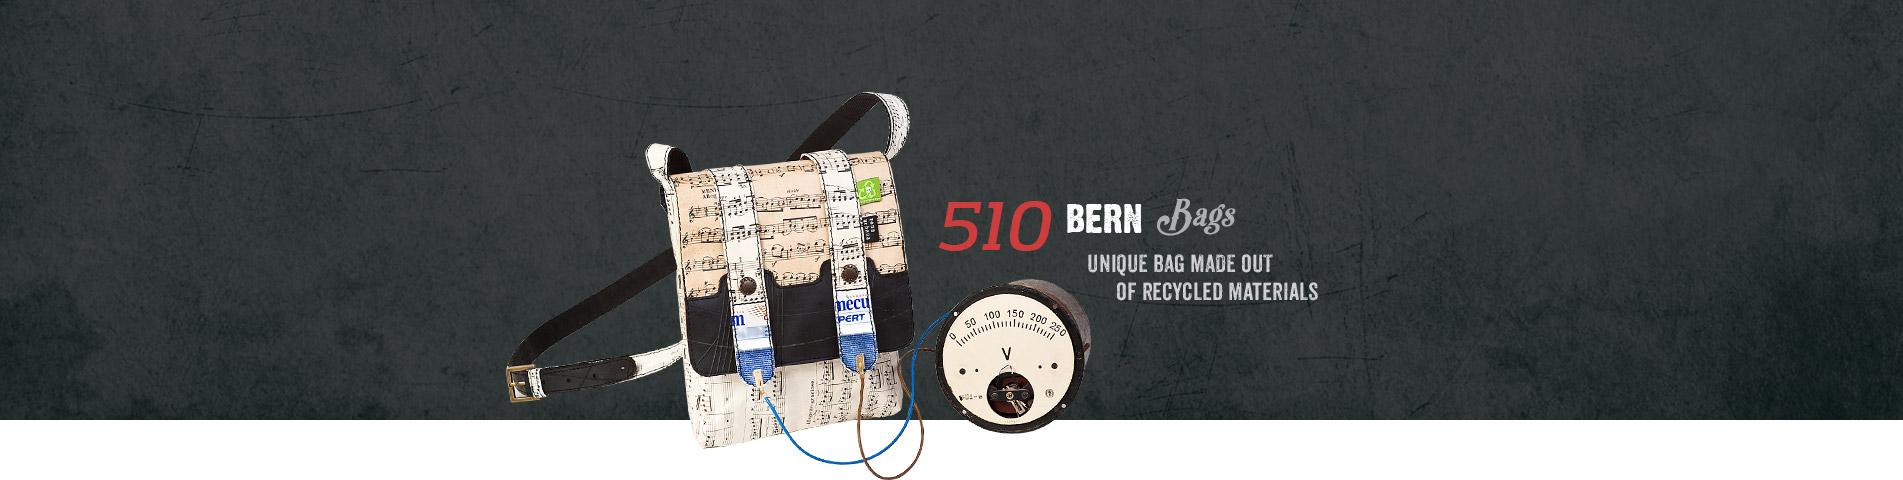 510 Bern Bags